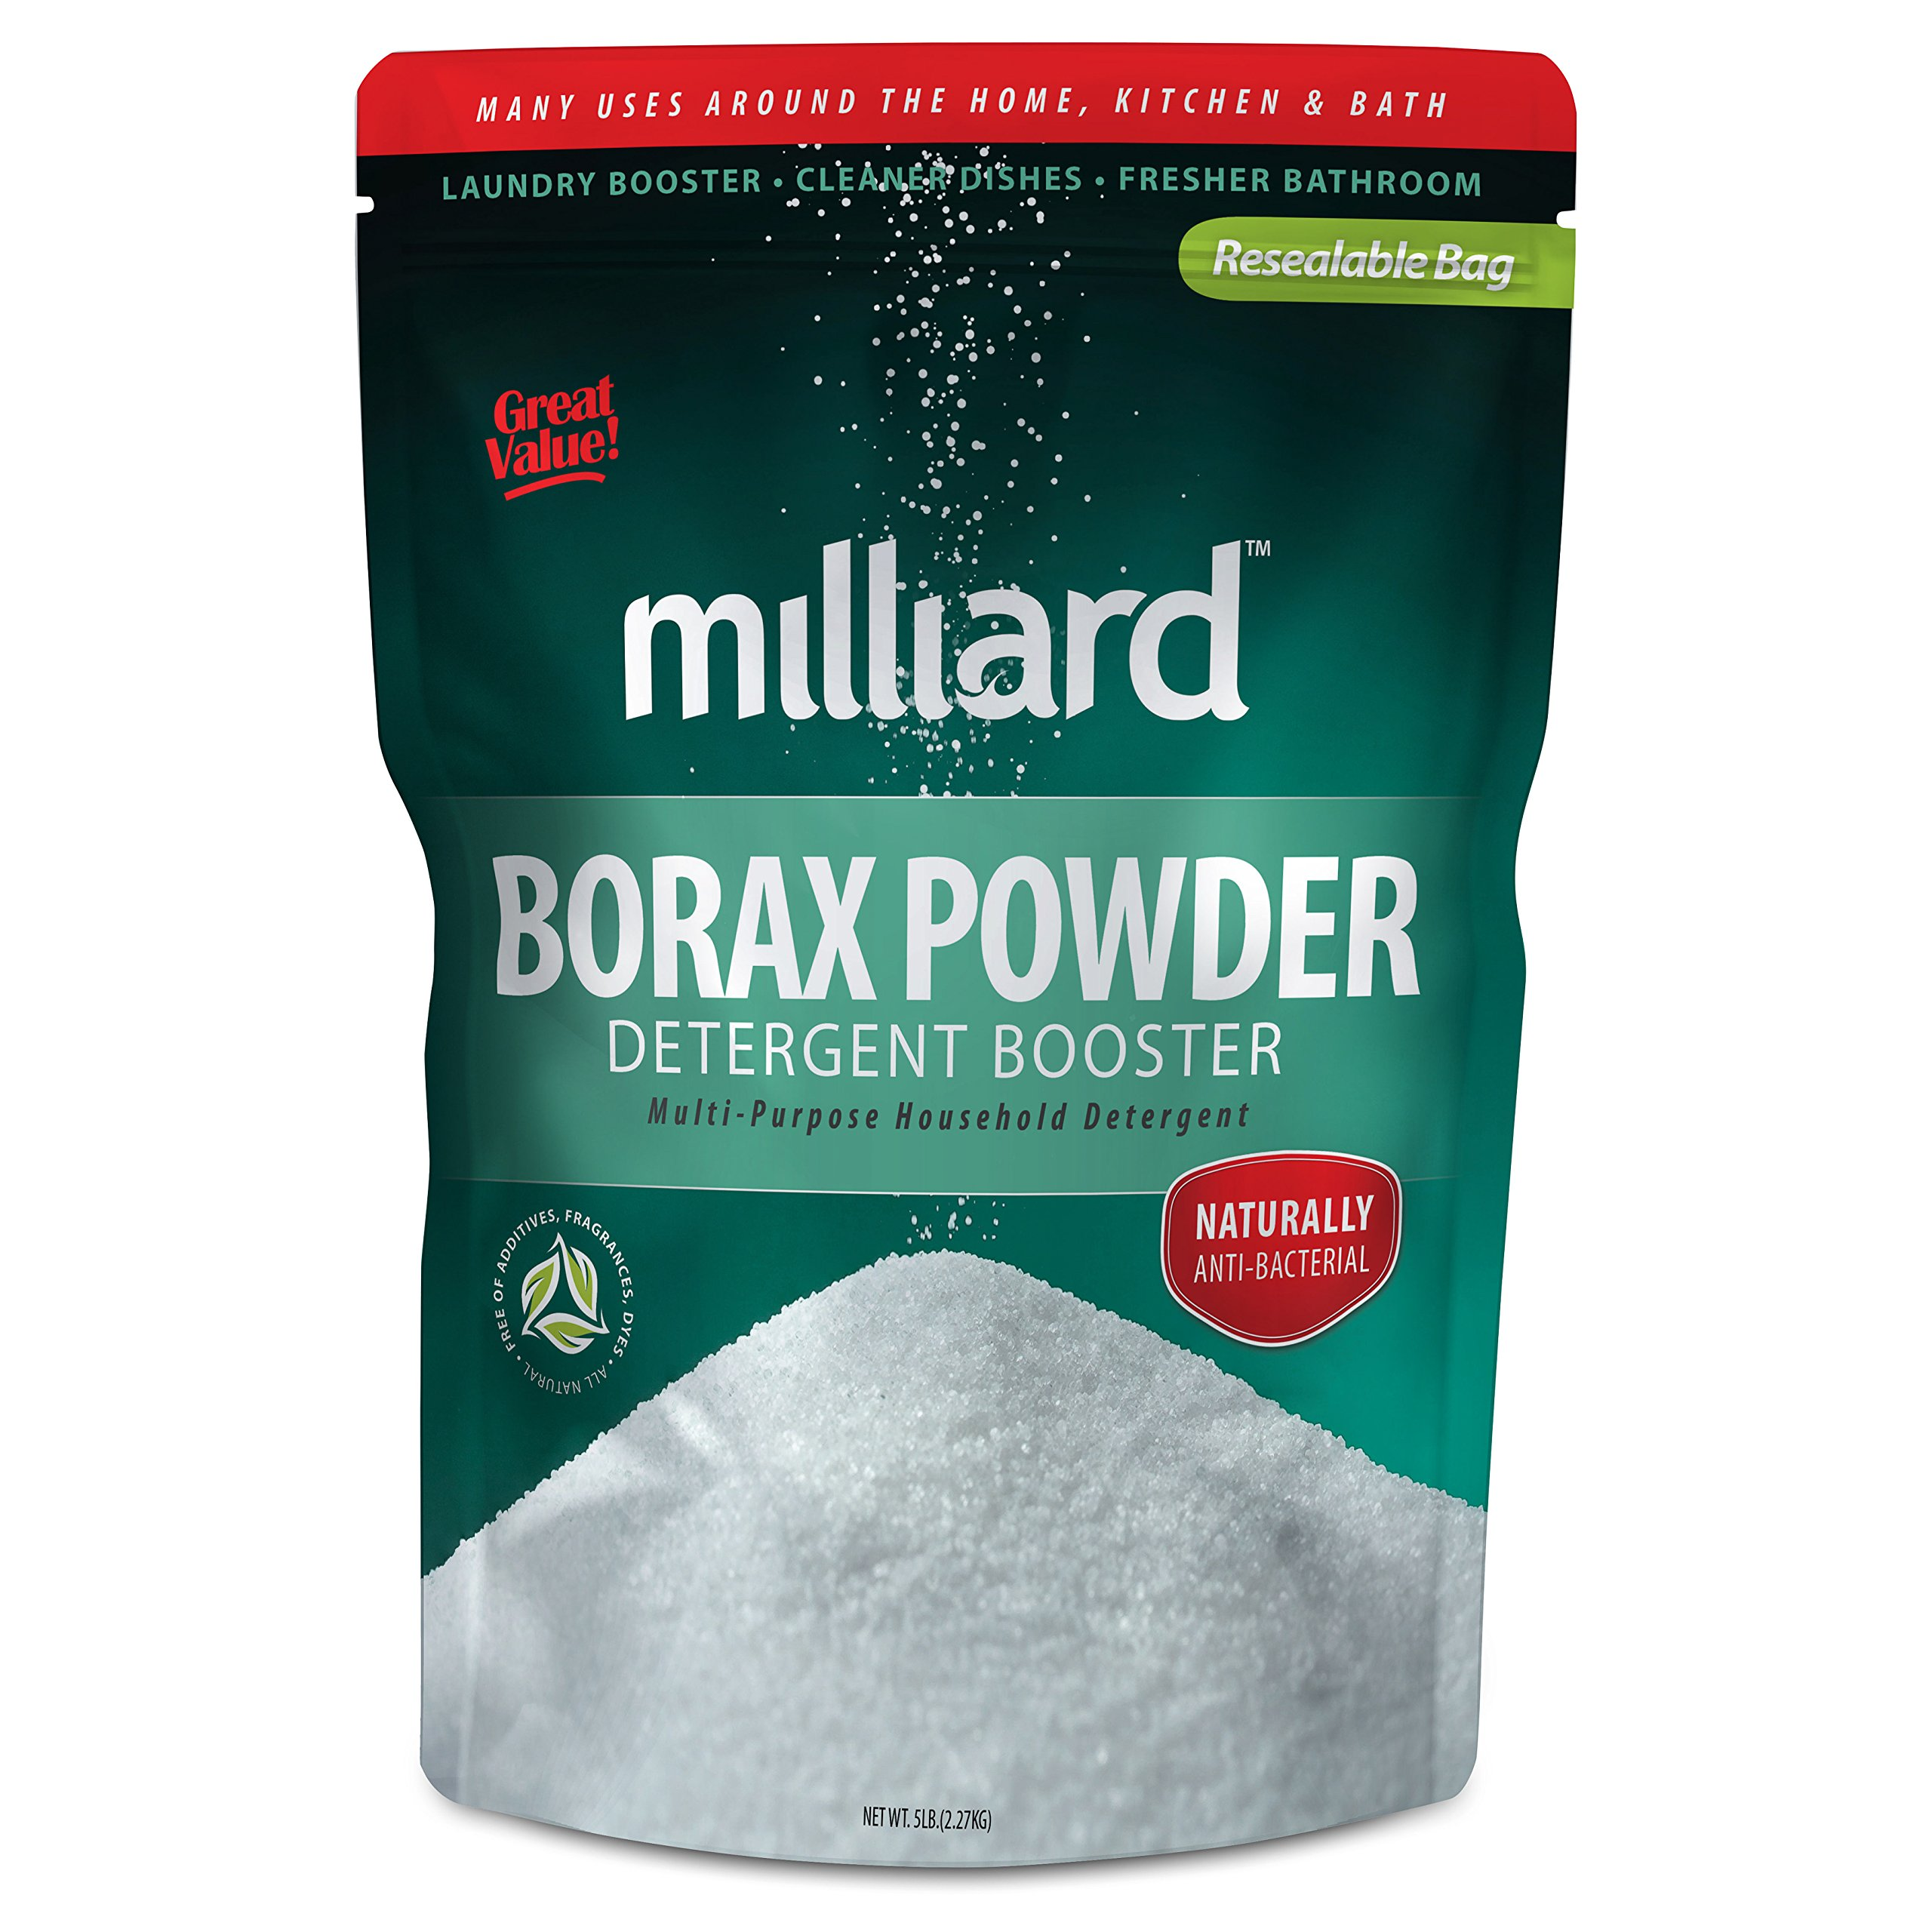 MILLIARD Borax Powder - Pure Multi-Purpose Cleaner 5 lb. Bag